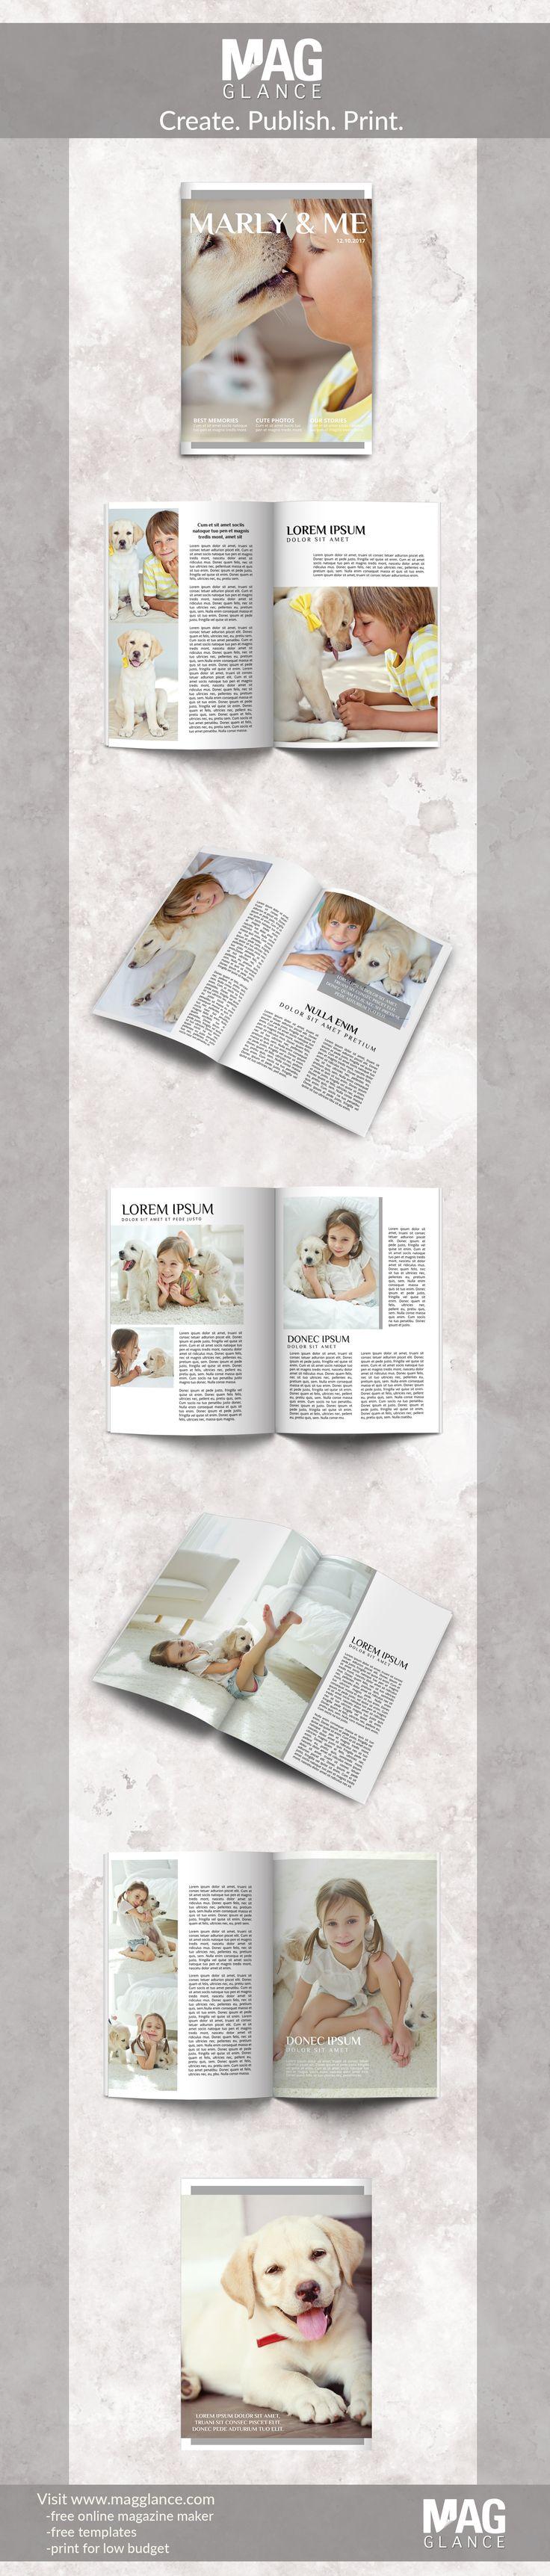 Luxus Fotocollage Selber Machen Ideen Ideen